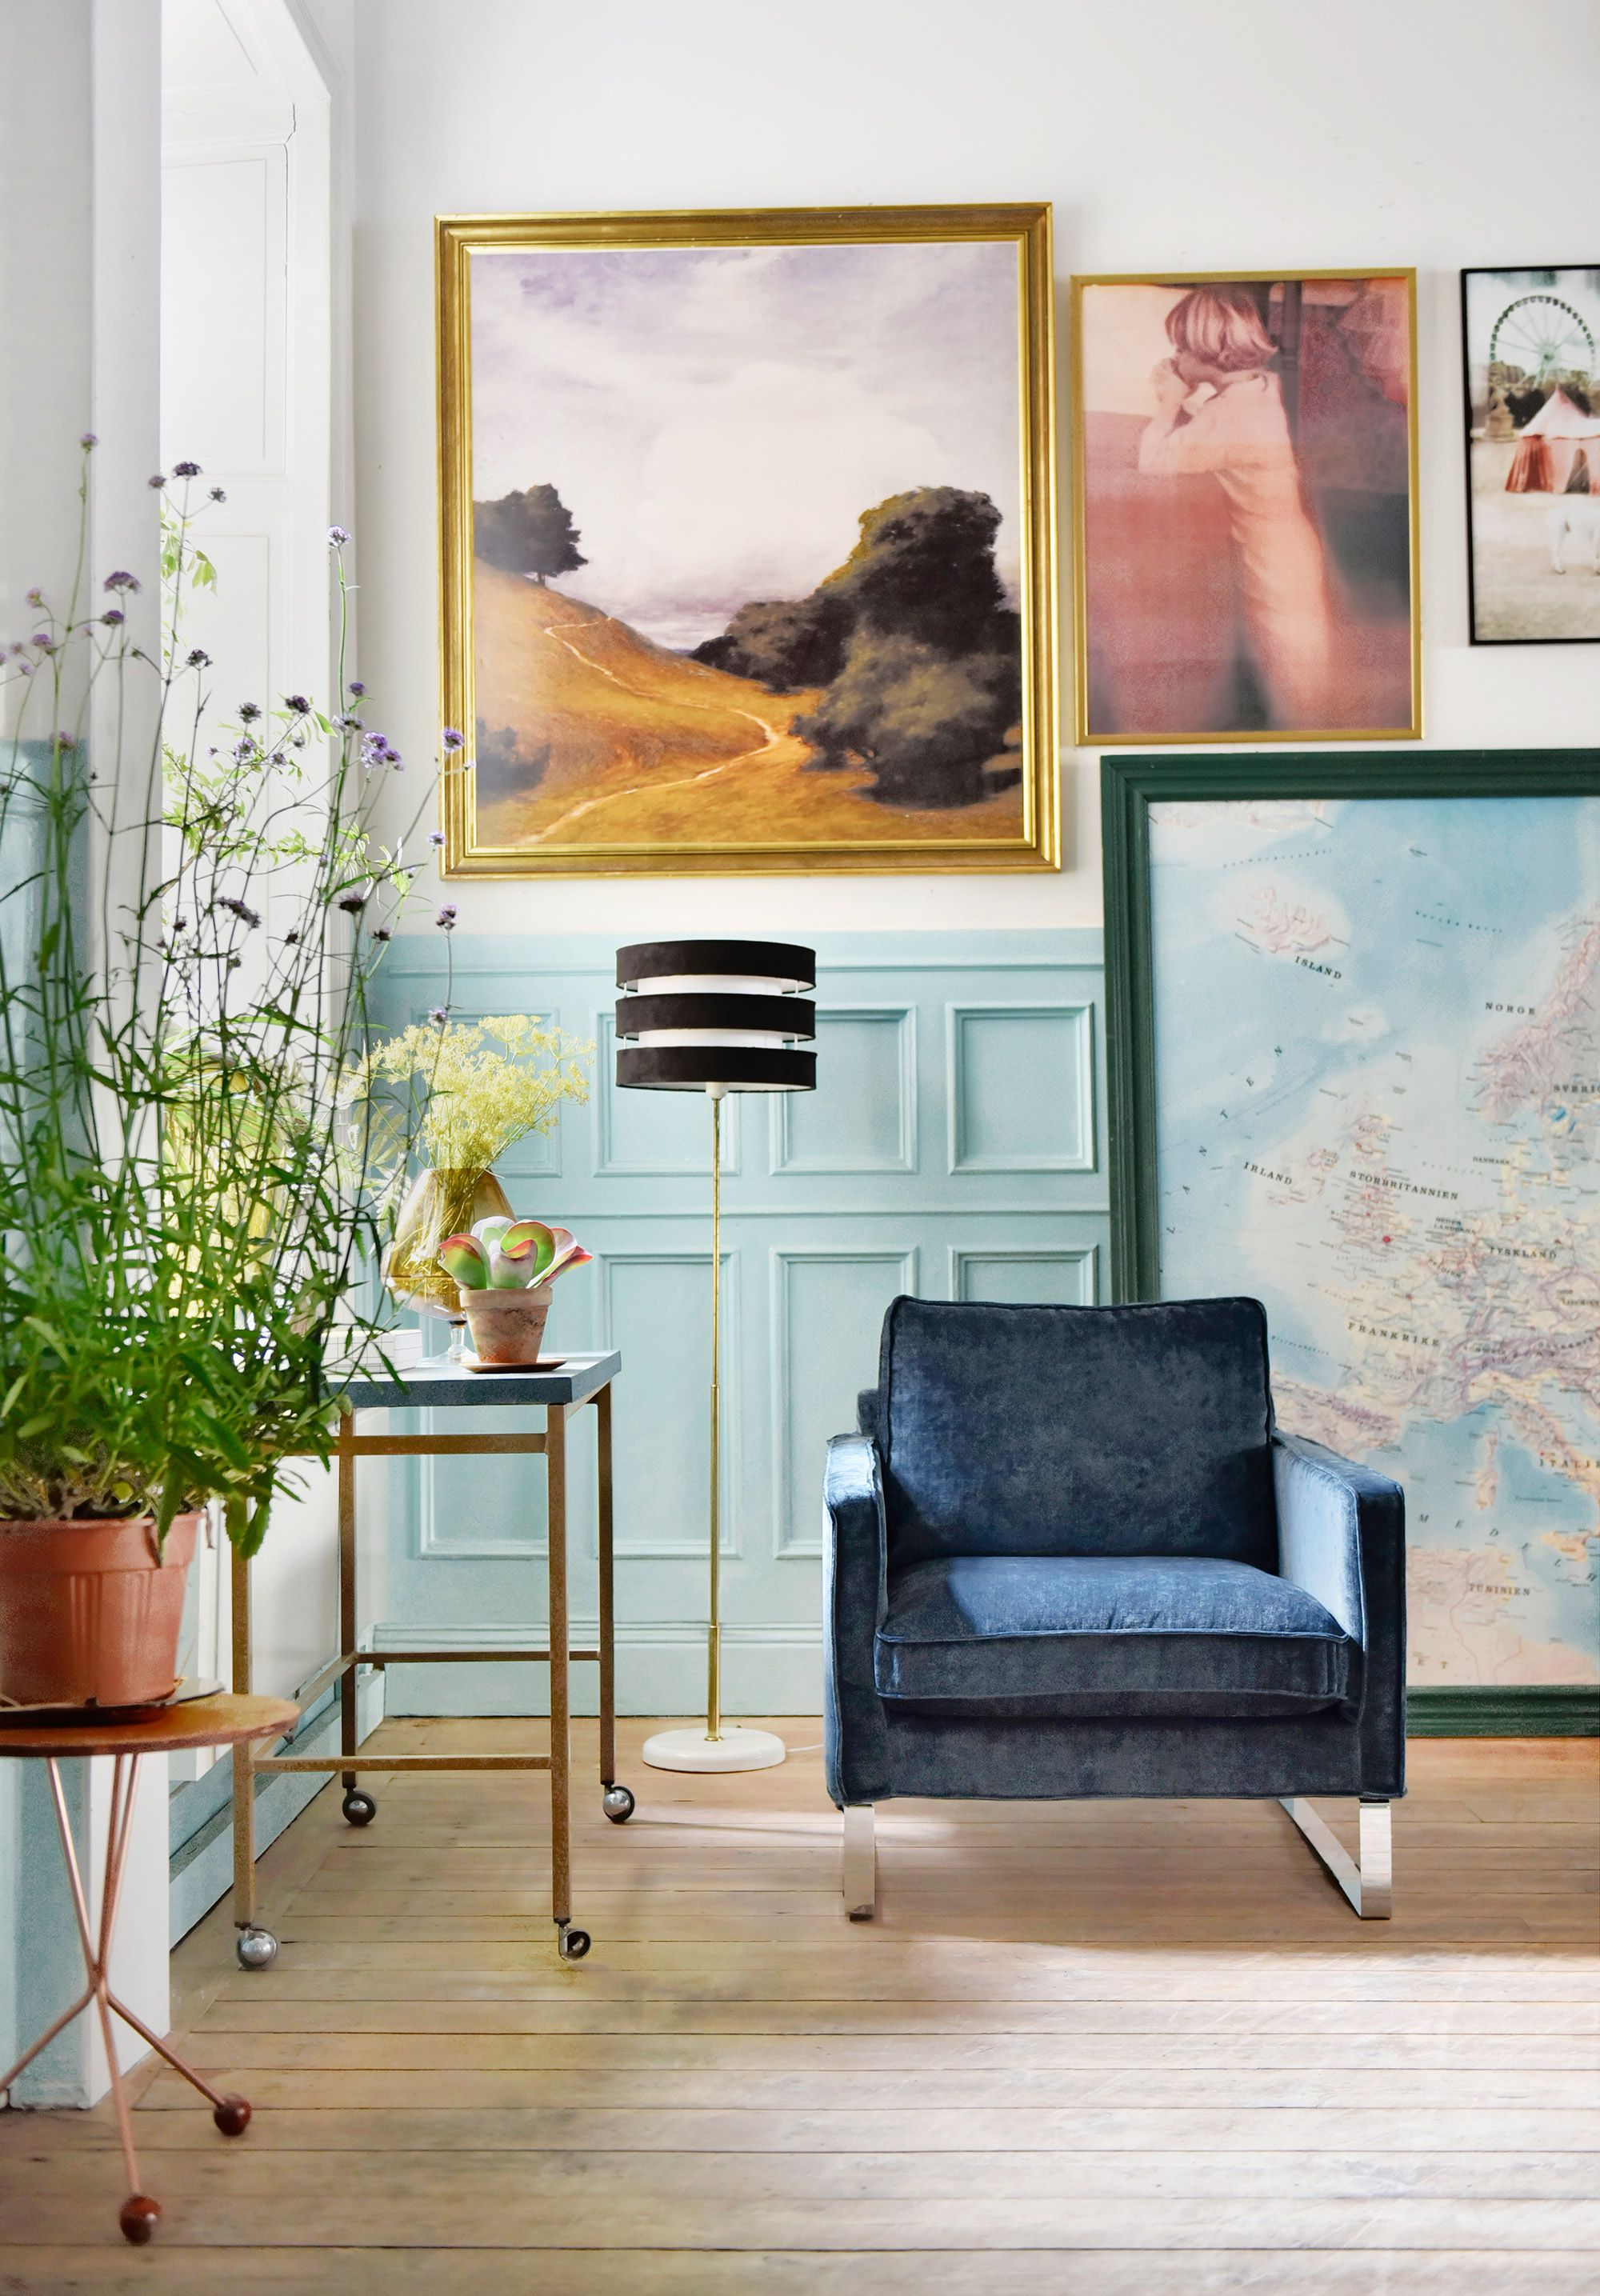 ikea kk bilder ikea bang na bangkok thailand homewares lifestyle landscape visual badregal. Black Bedroom Furniture Sets. Home Design Ideas